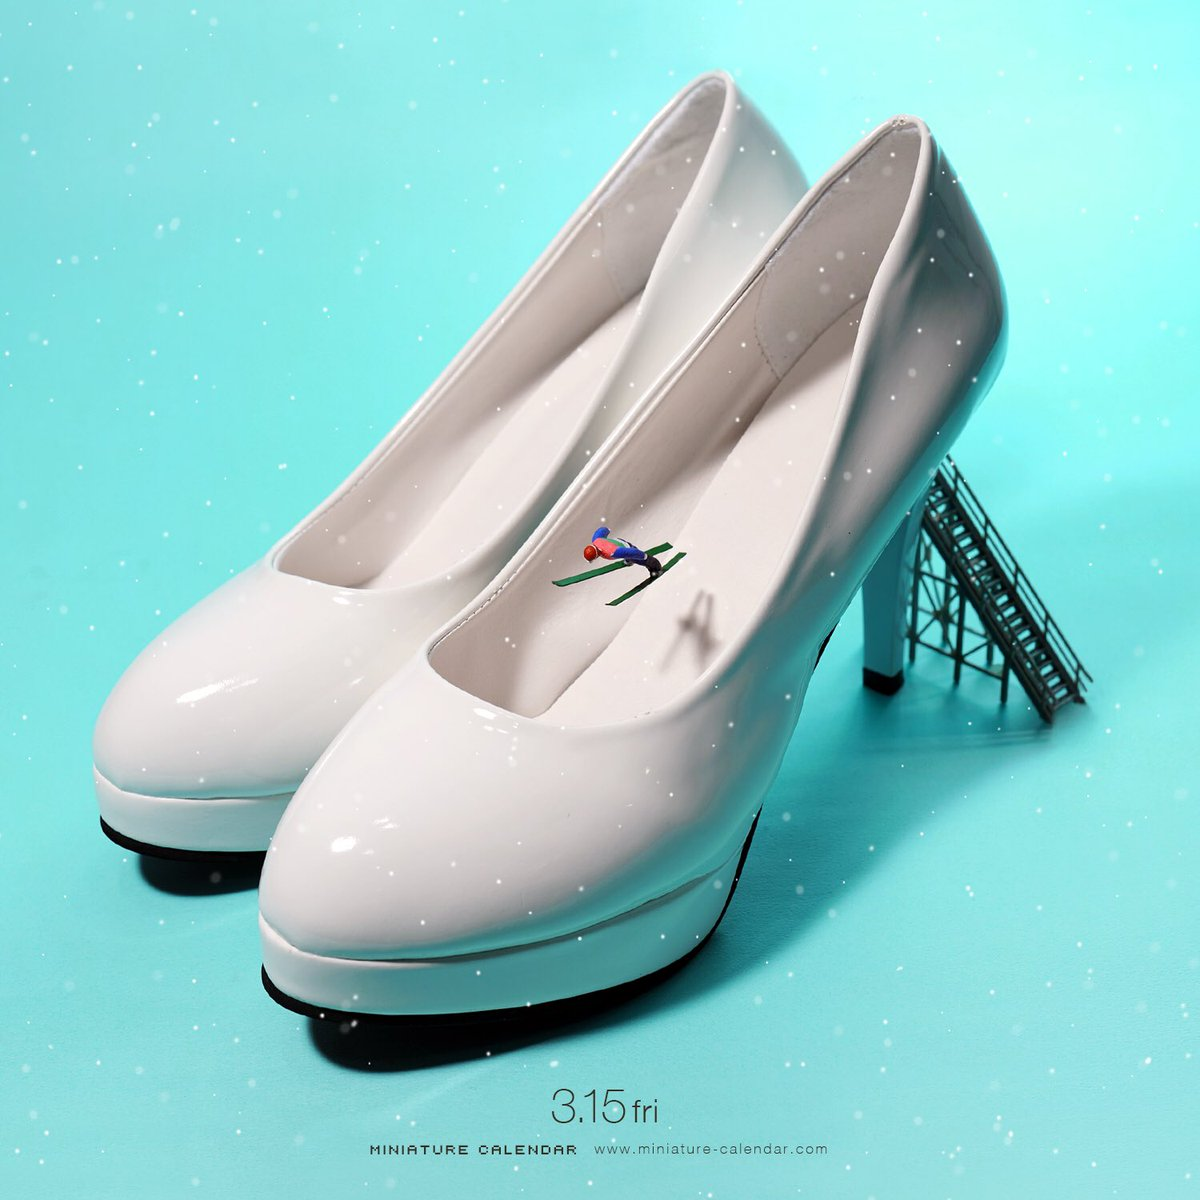 田中達也 Tatsuya Tanaka's photo on #靴の記念日